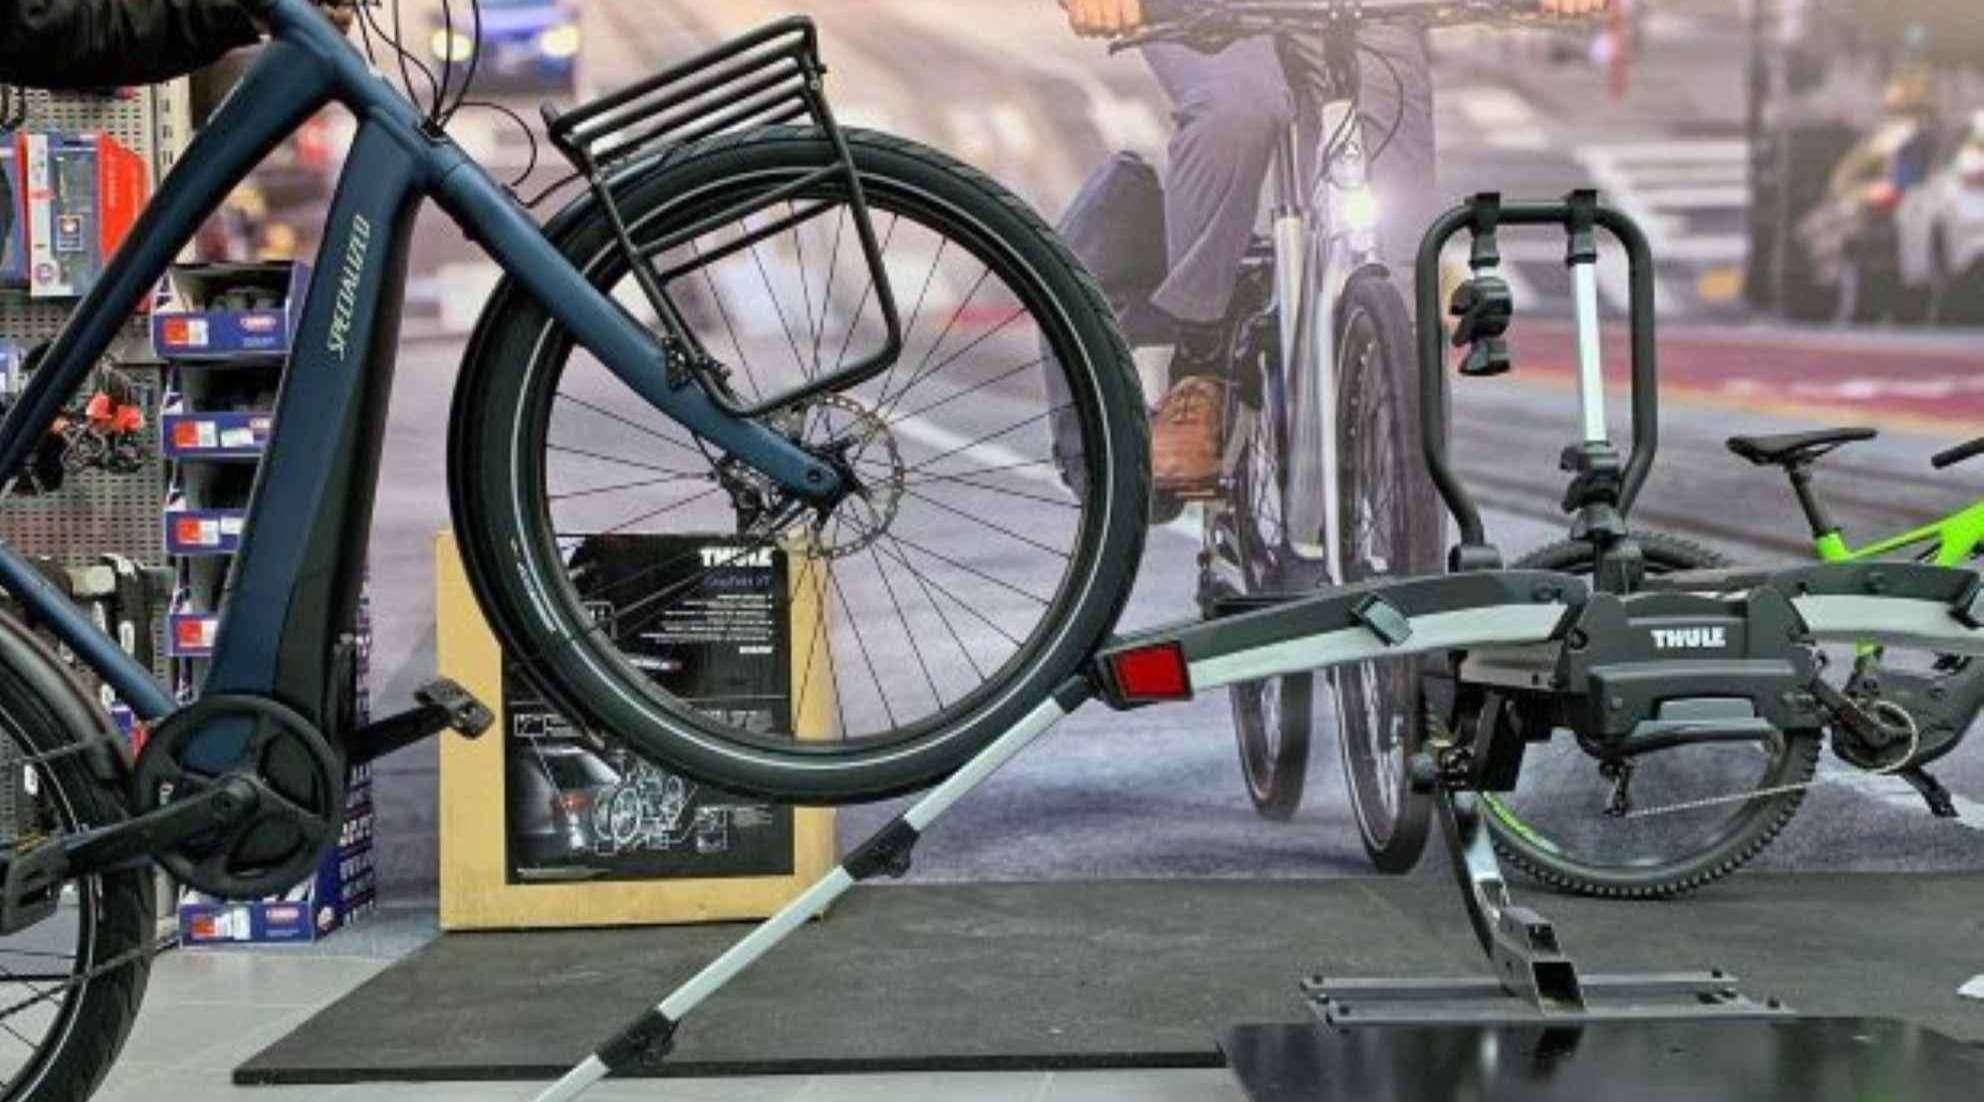 e-bike specific bike racks